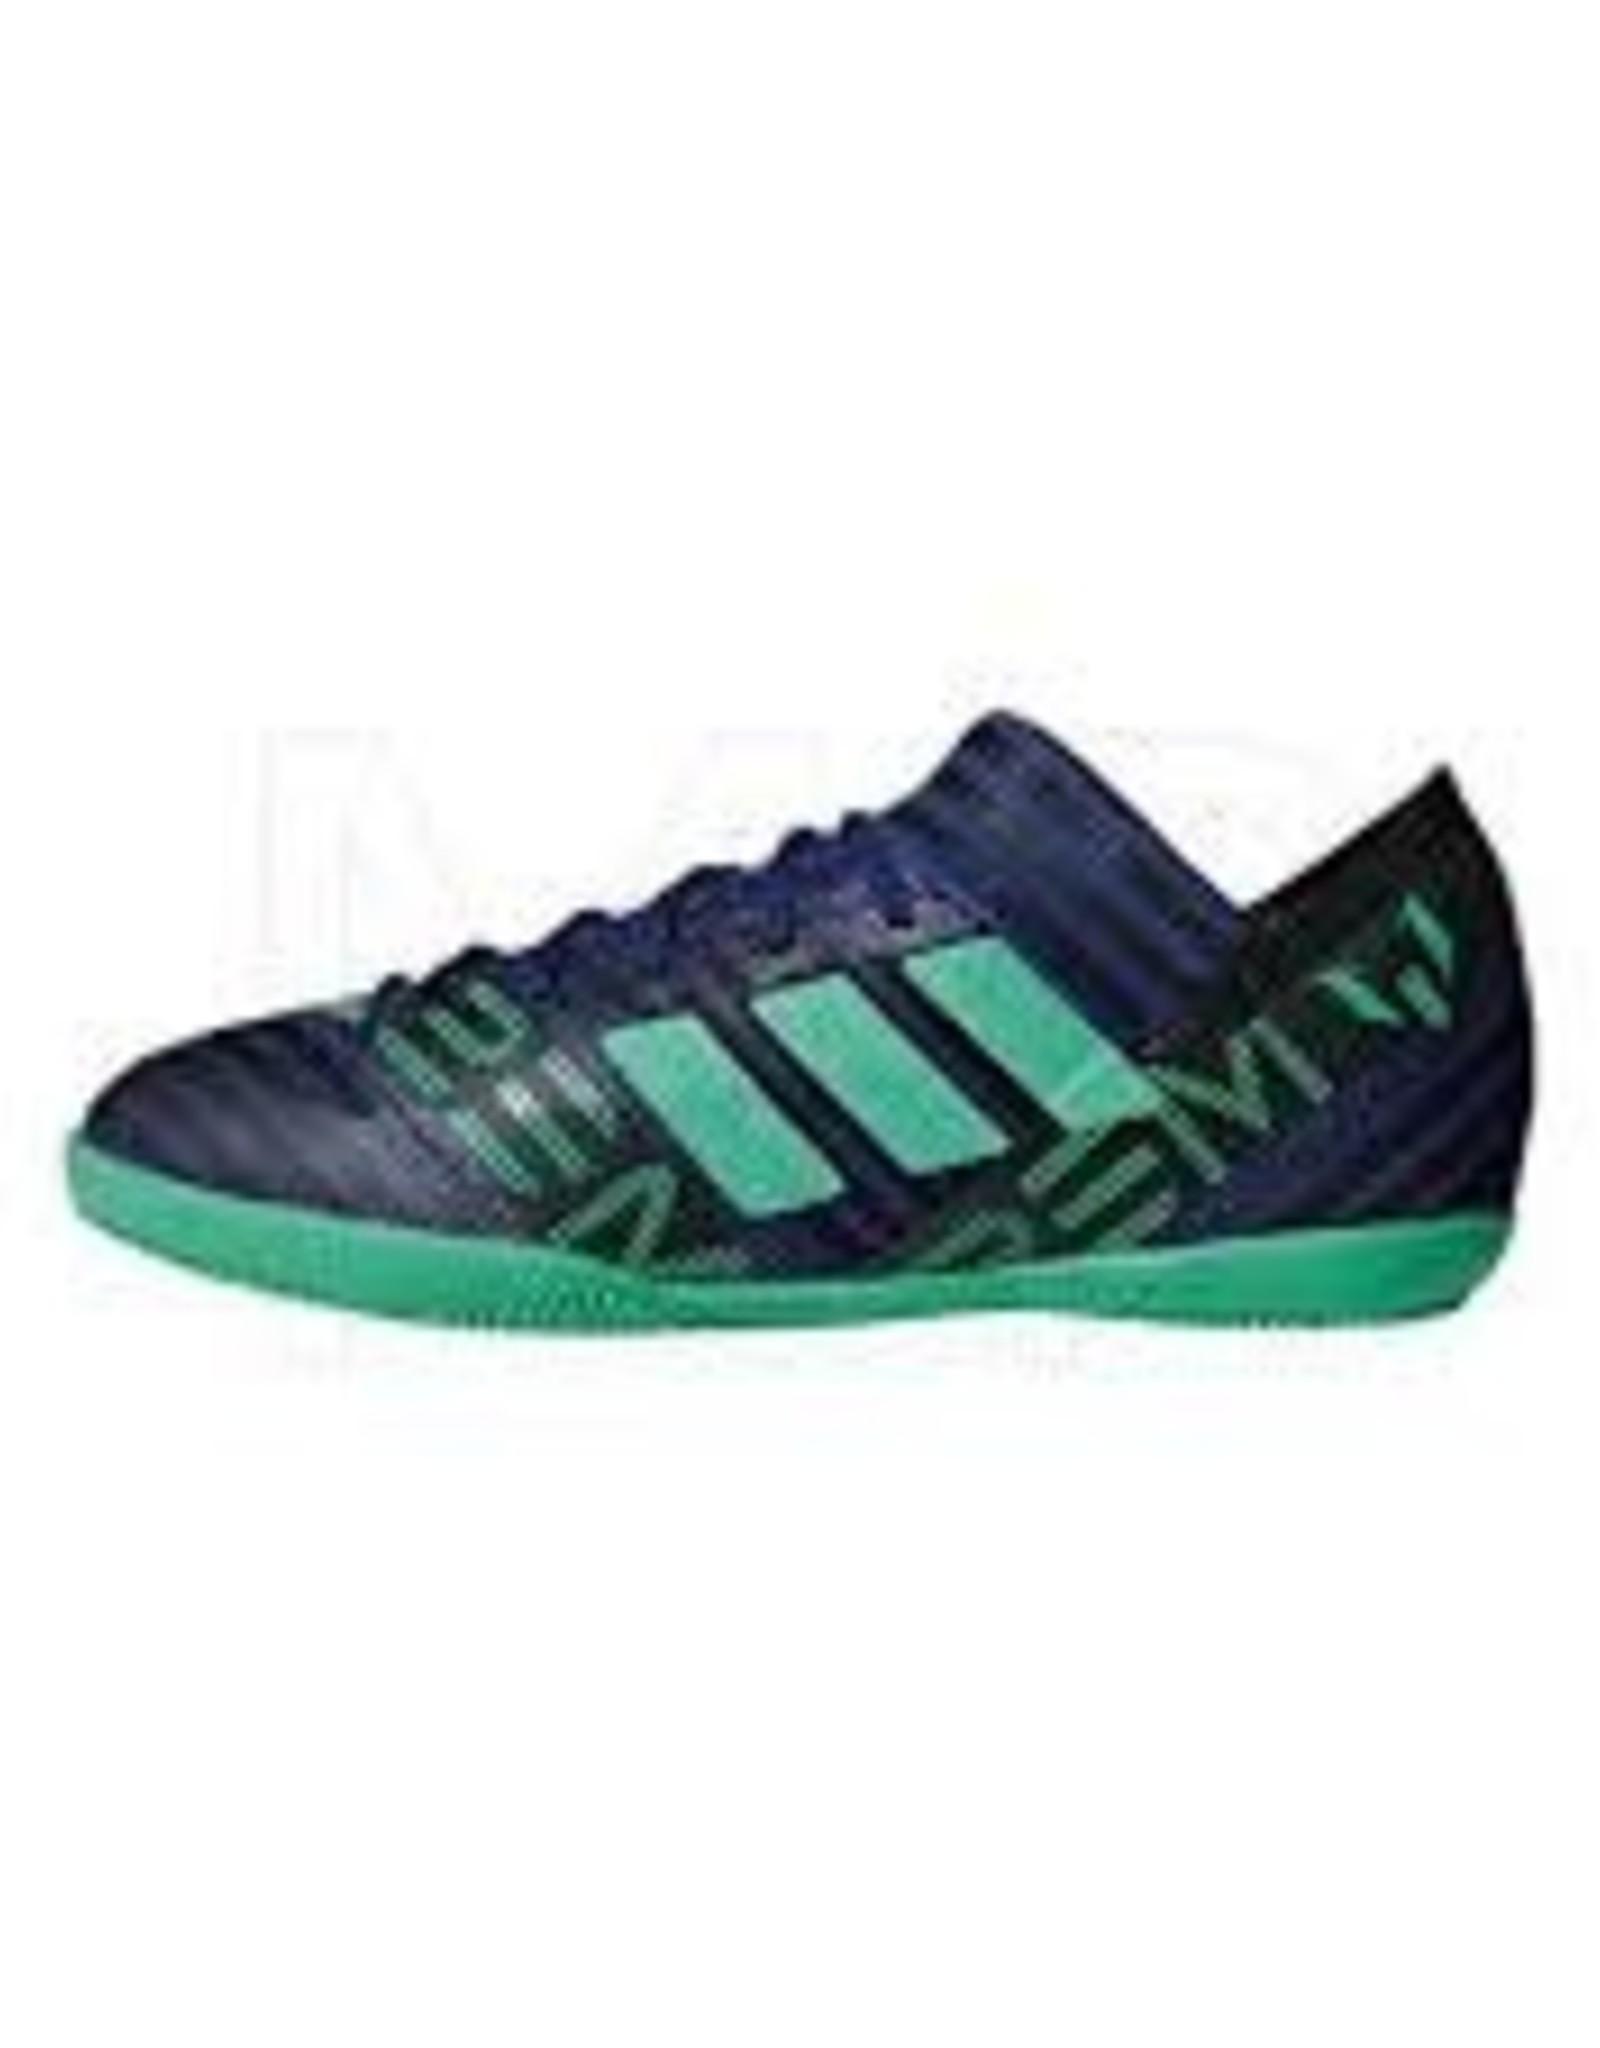 Adidas Nemeziz Messi Tango jr